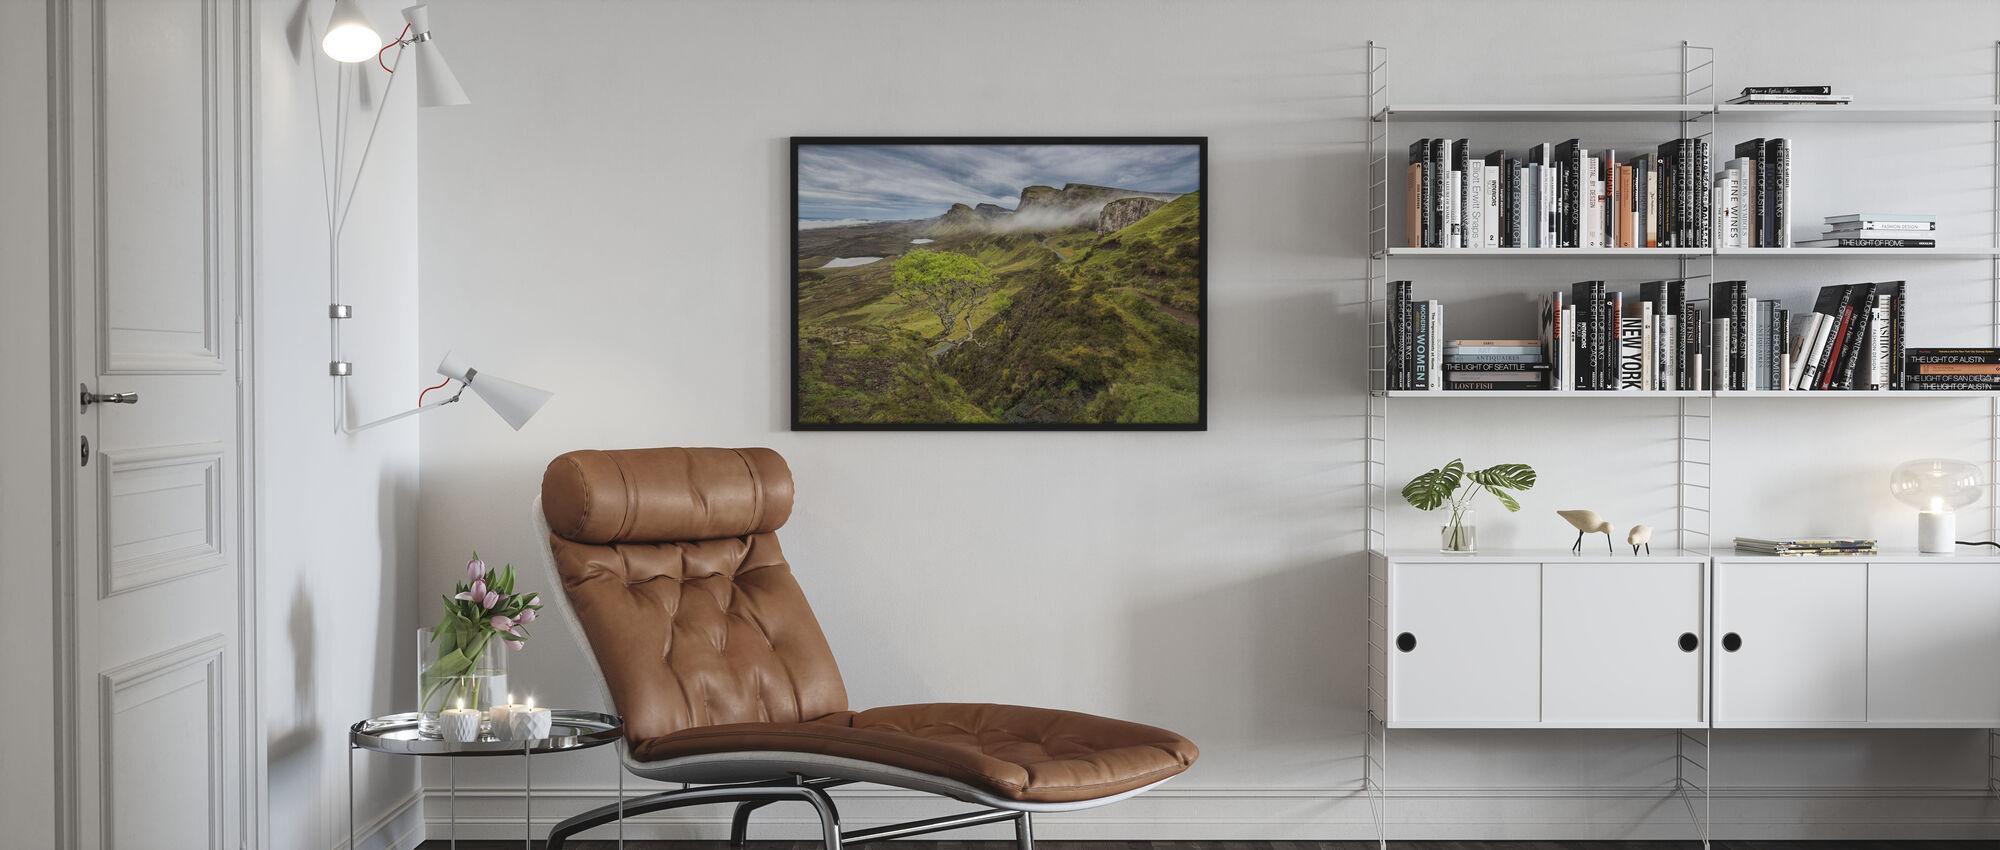 Quirang, Isle of Skye - Scotland - Poster - Living Room